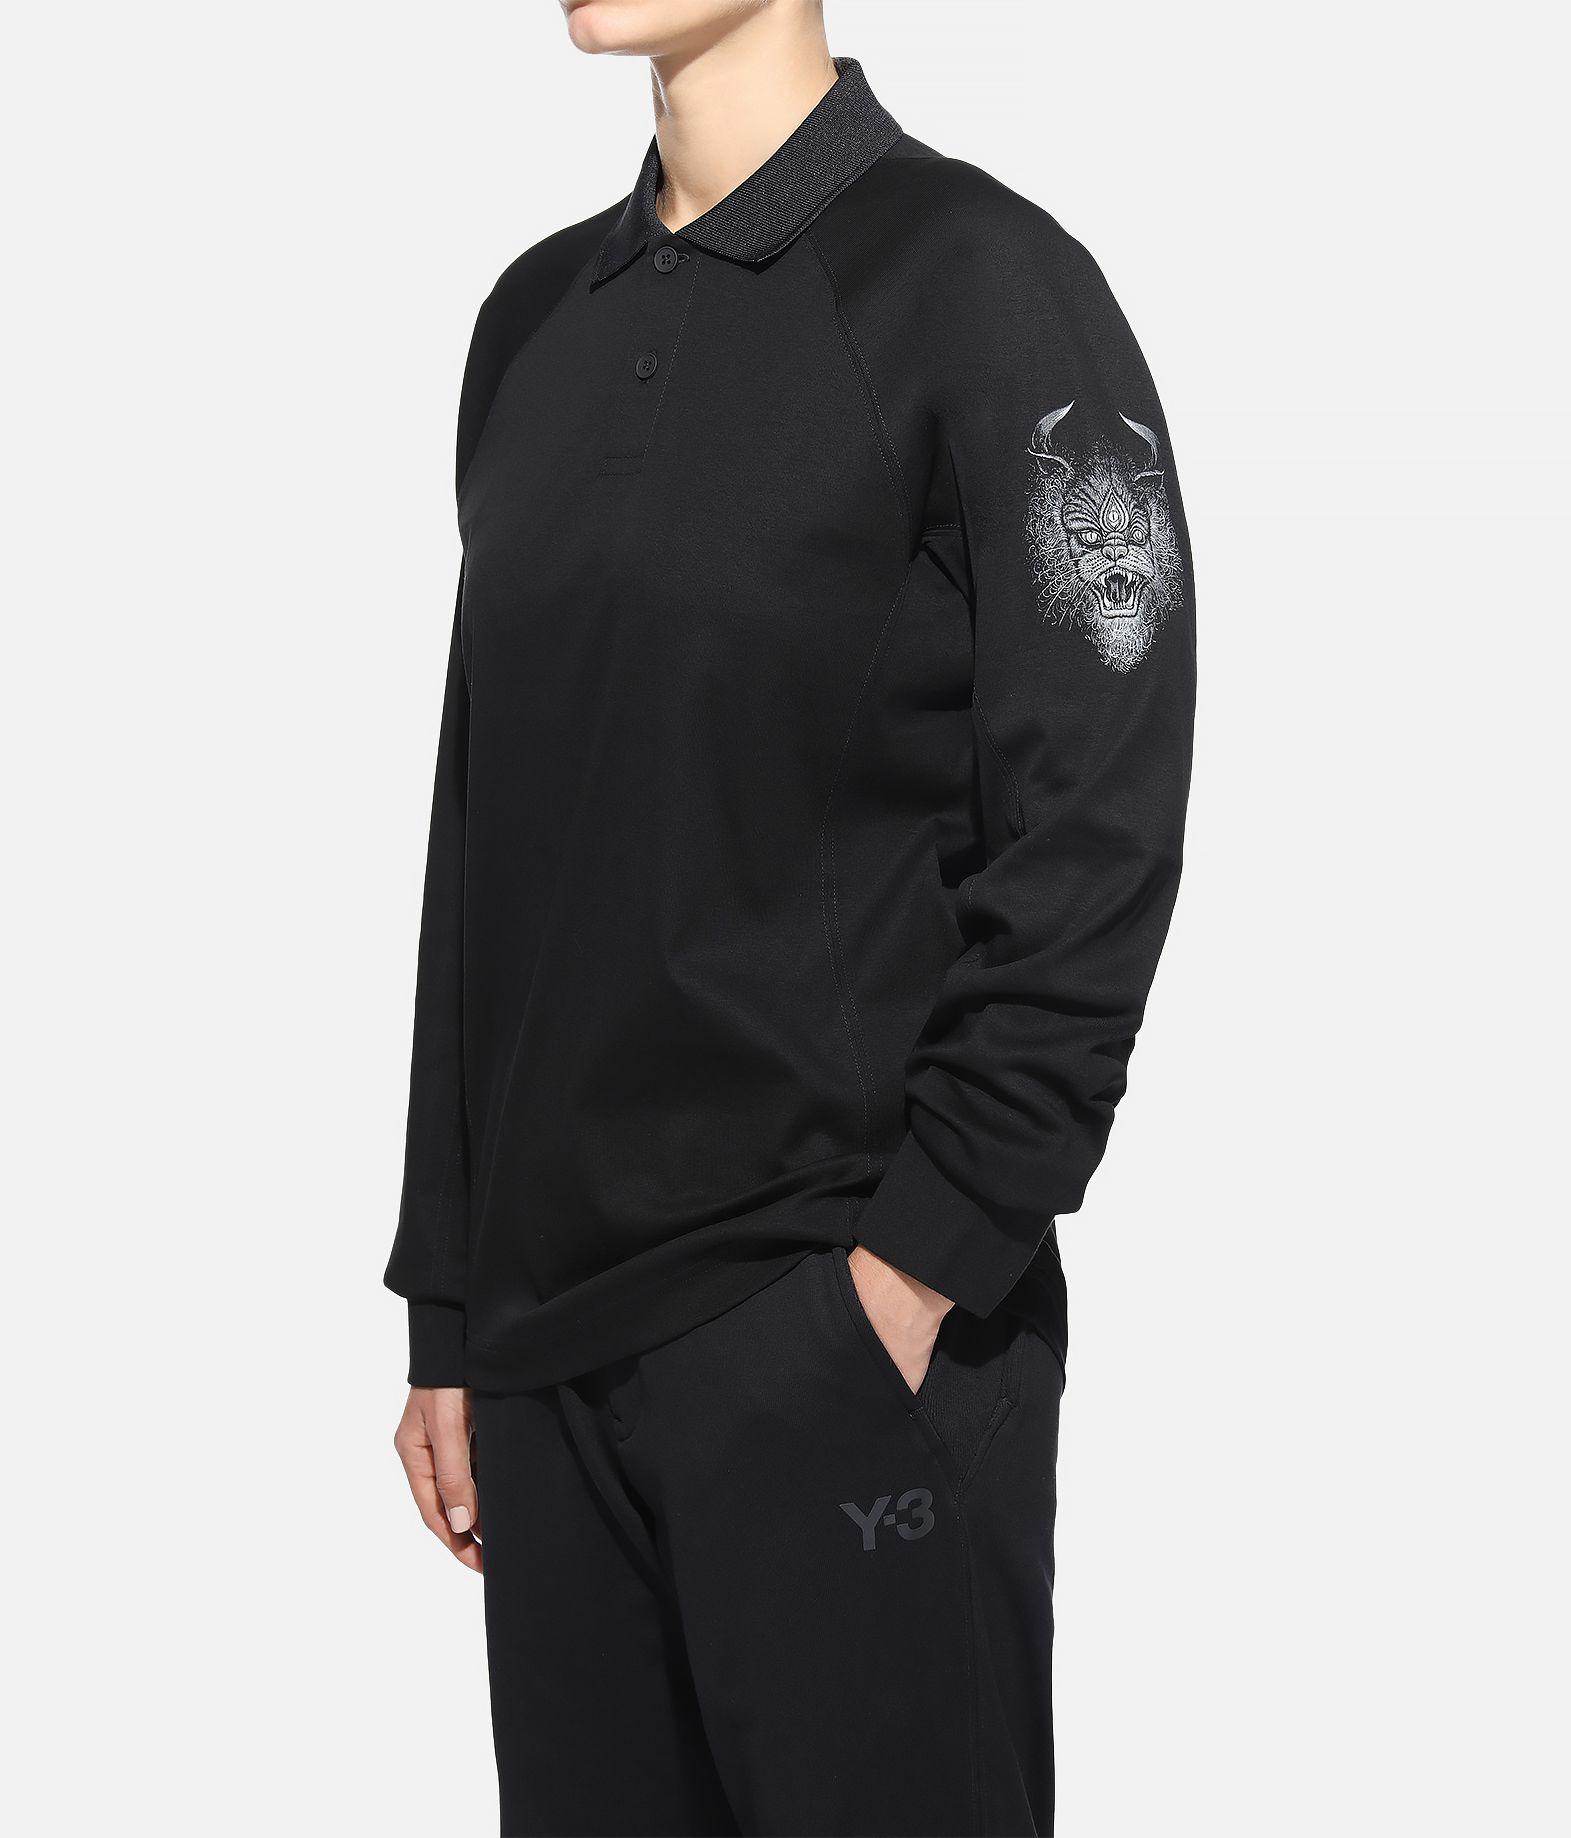 Y-3 Y-3 Long Sleeve Polo Shirt  Polohemd Dame e